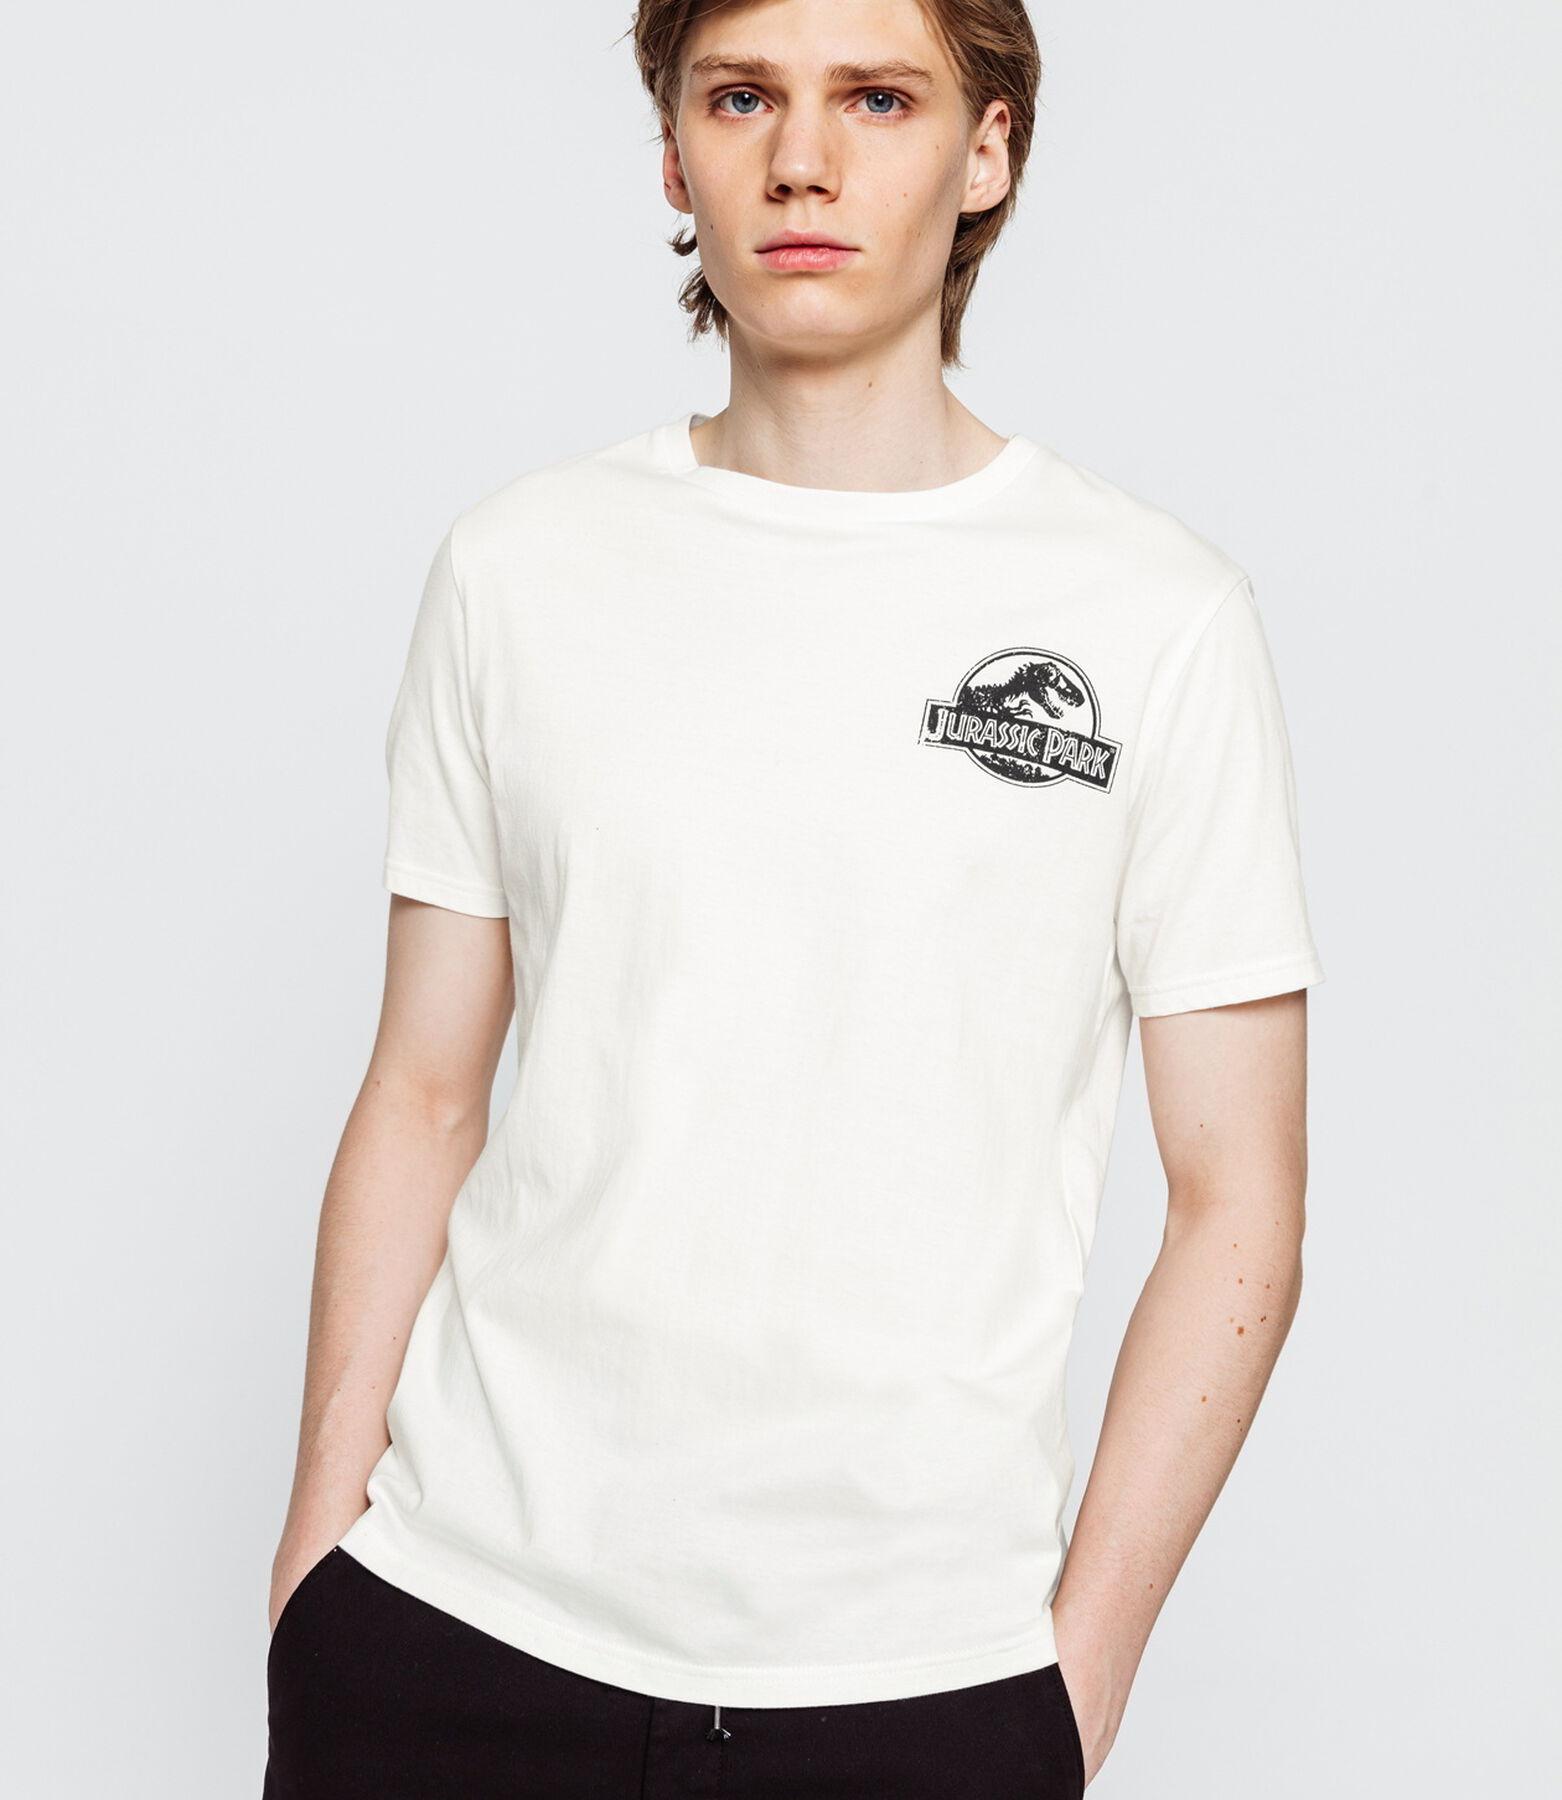 T-shirt Jurassic Park devant dos